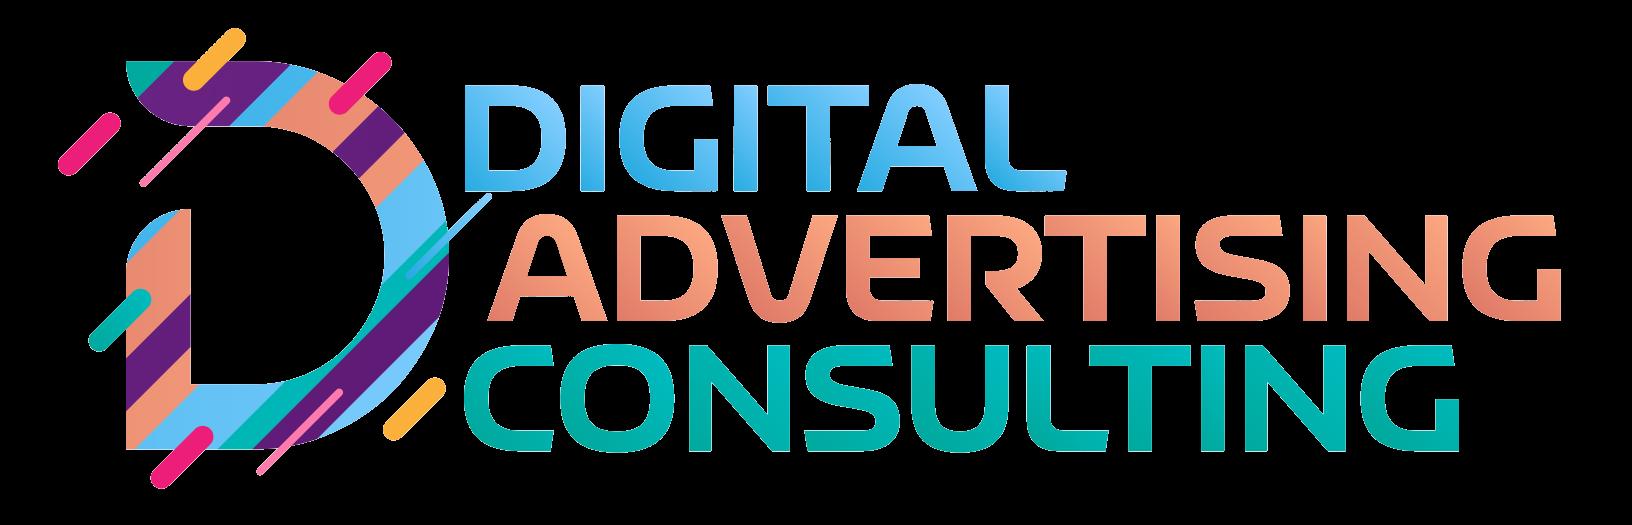 DigitalAdvertising01